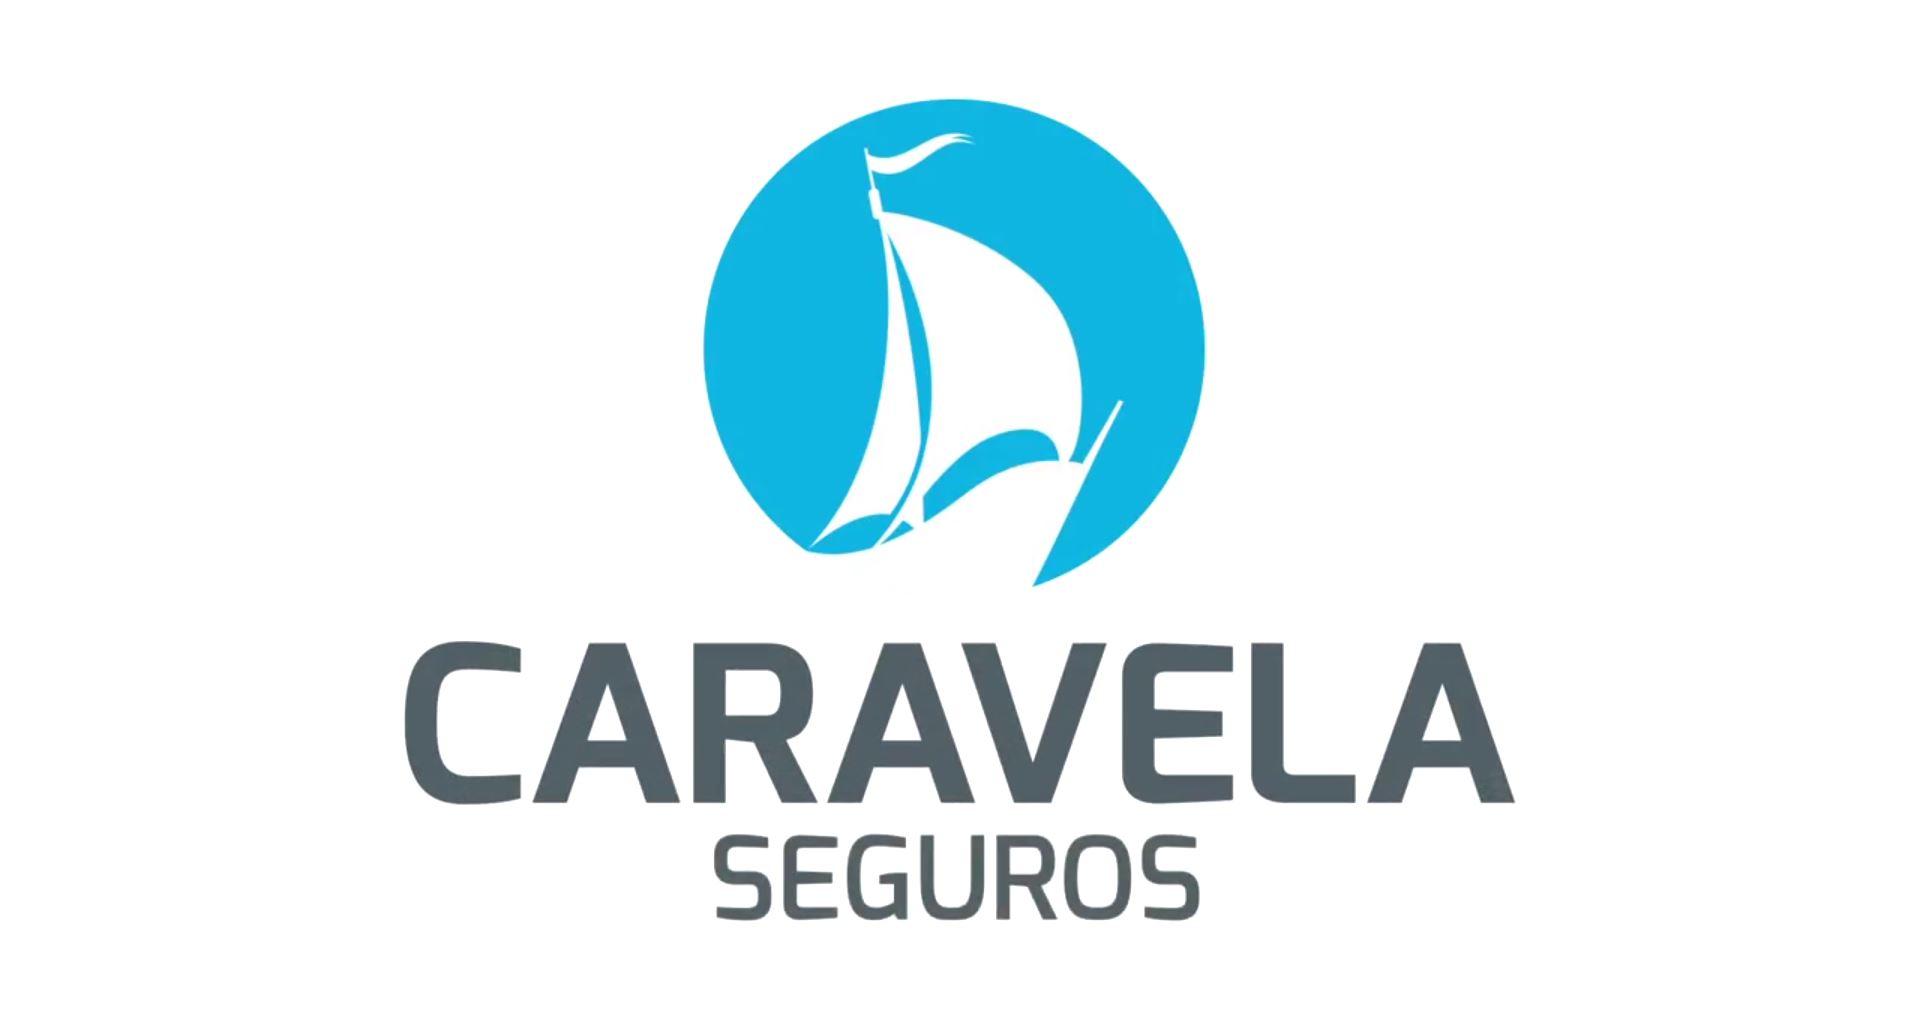 Carabela Seguros logo Sailing-Boat on blue Circle